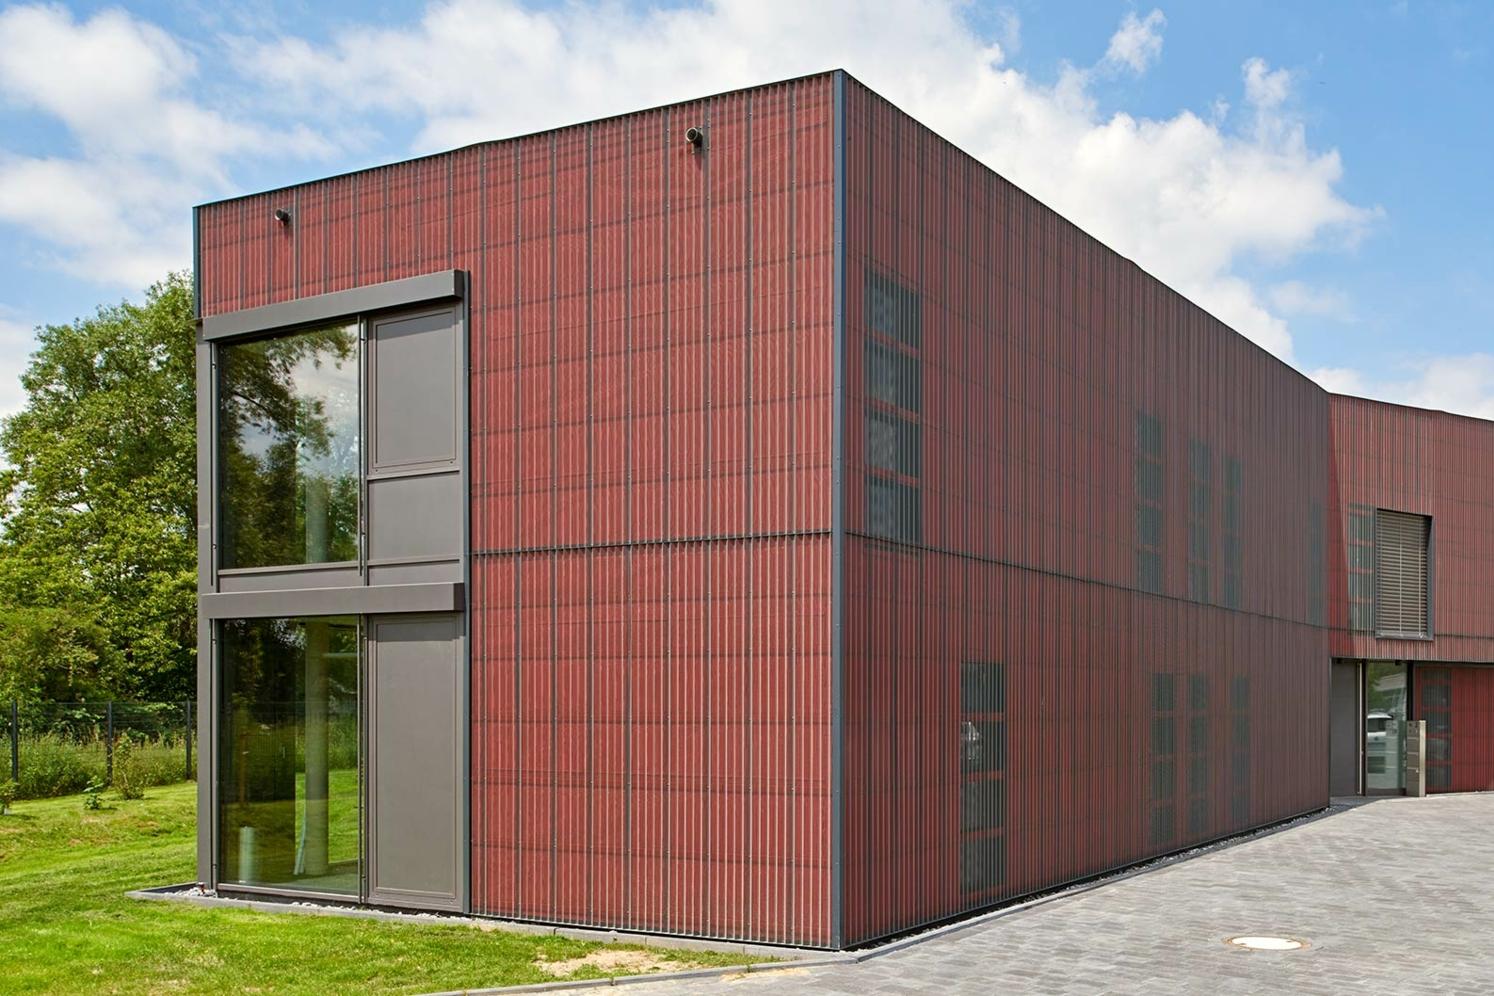 DELTA®-FASSADE COLOR rot an einem Bürogebäude in Hamm